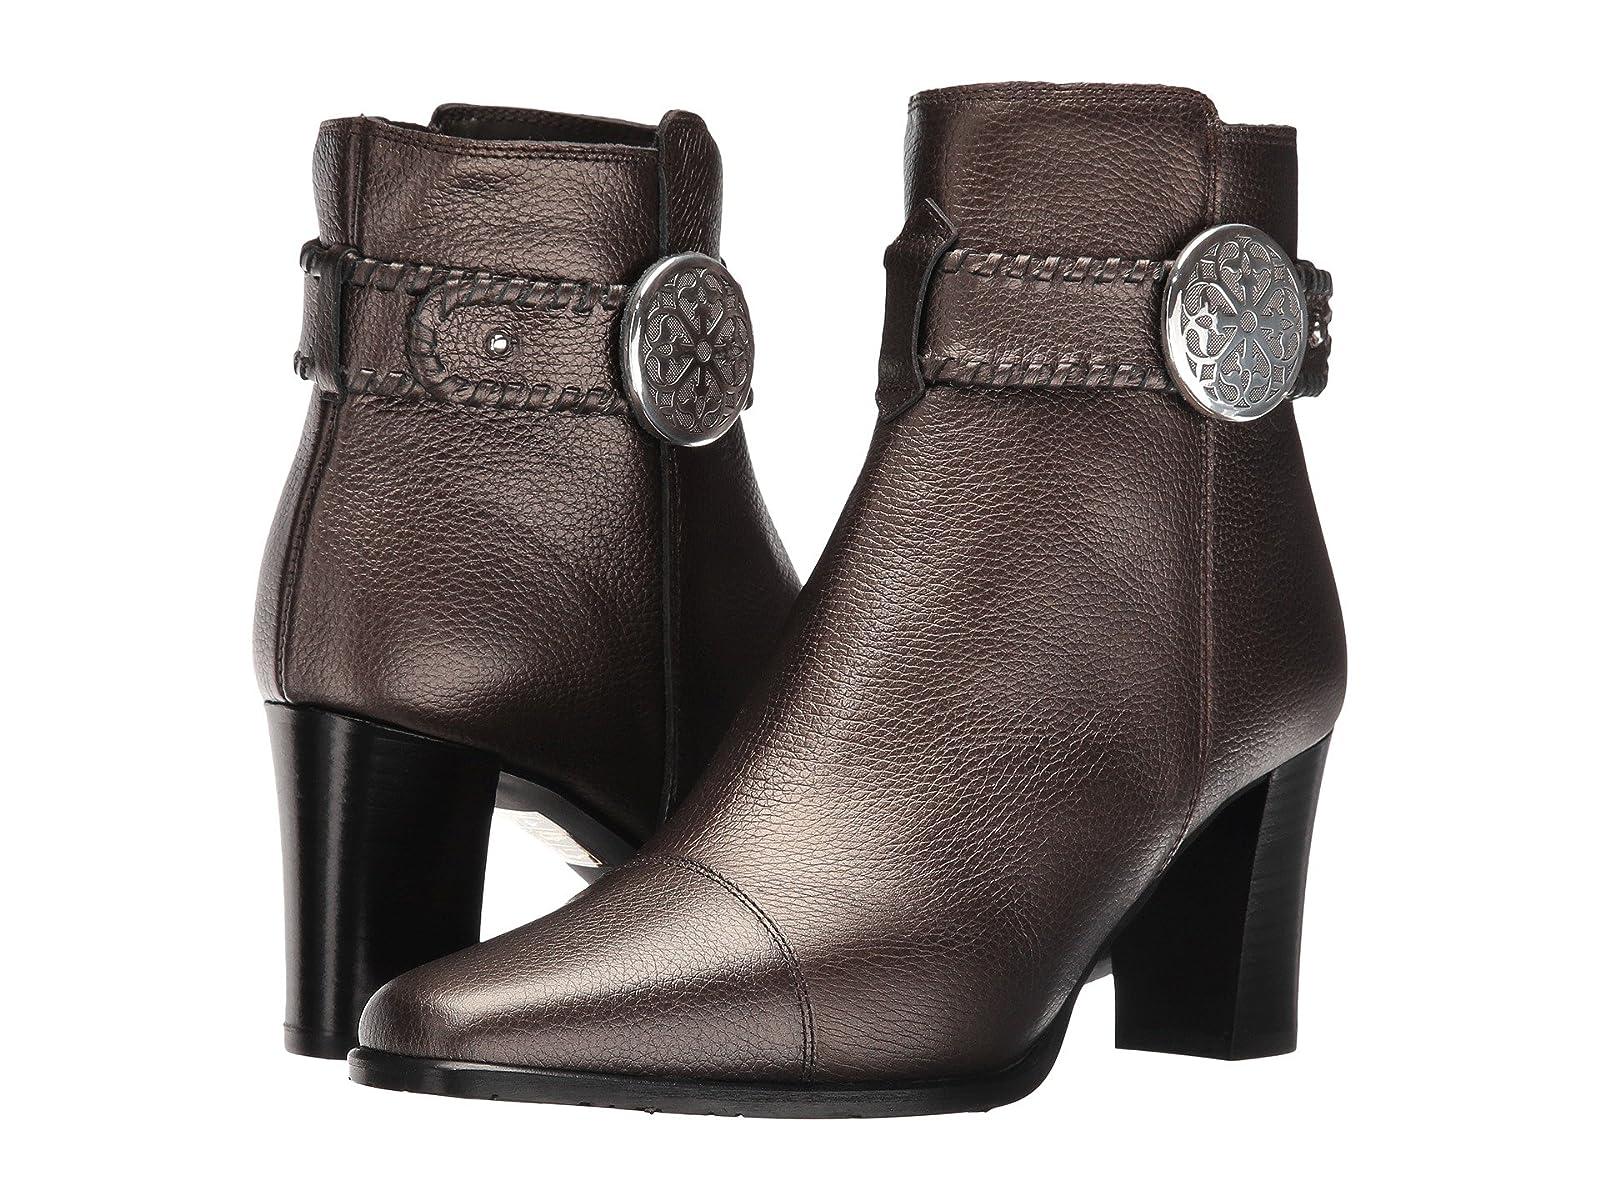 Brighton RyleeCheap and distinctive eye-catching shoes